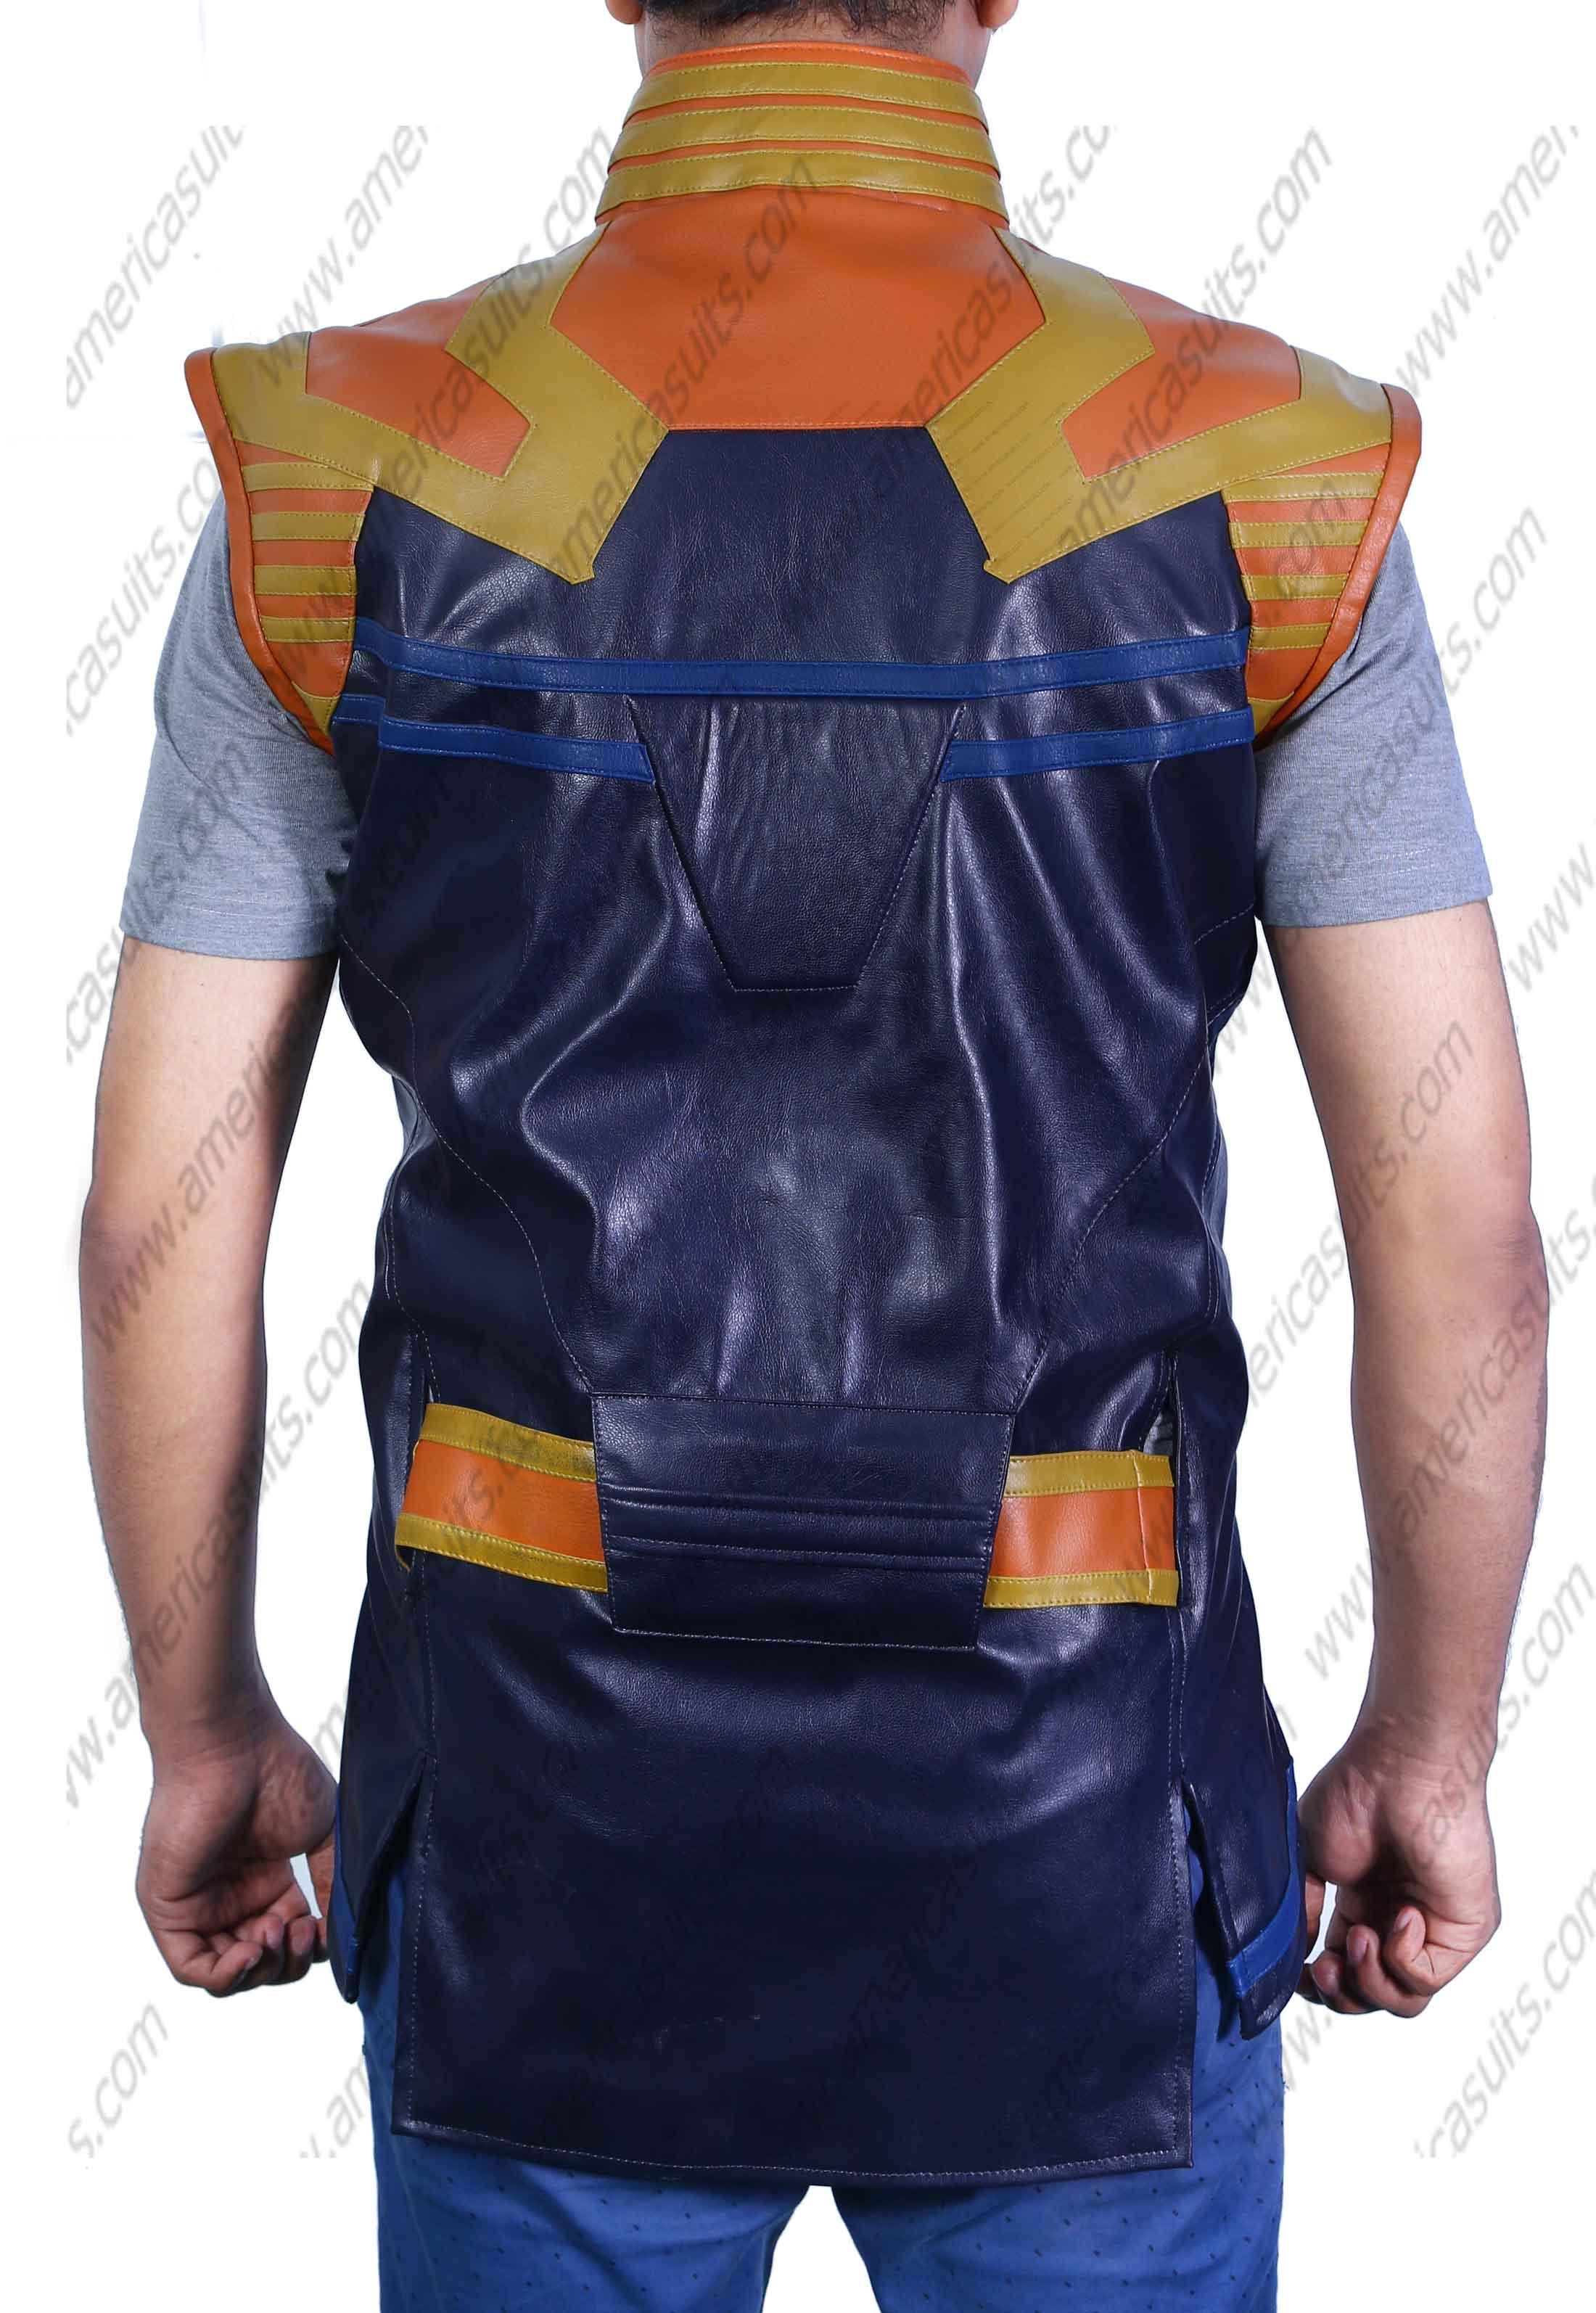 thanos-avengers-infinity-war-jacket